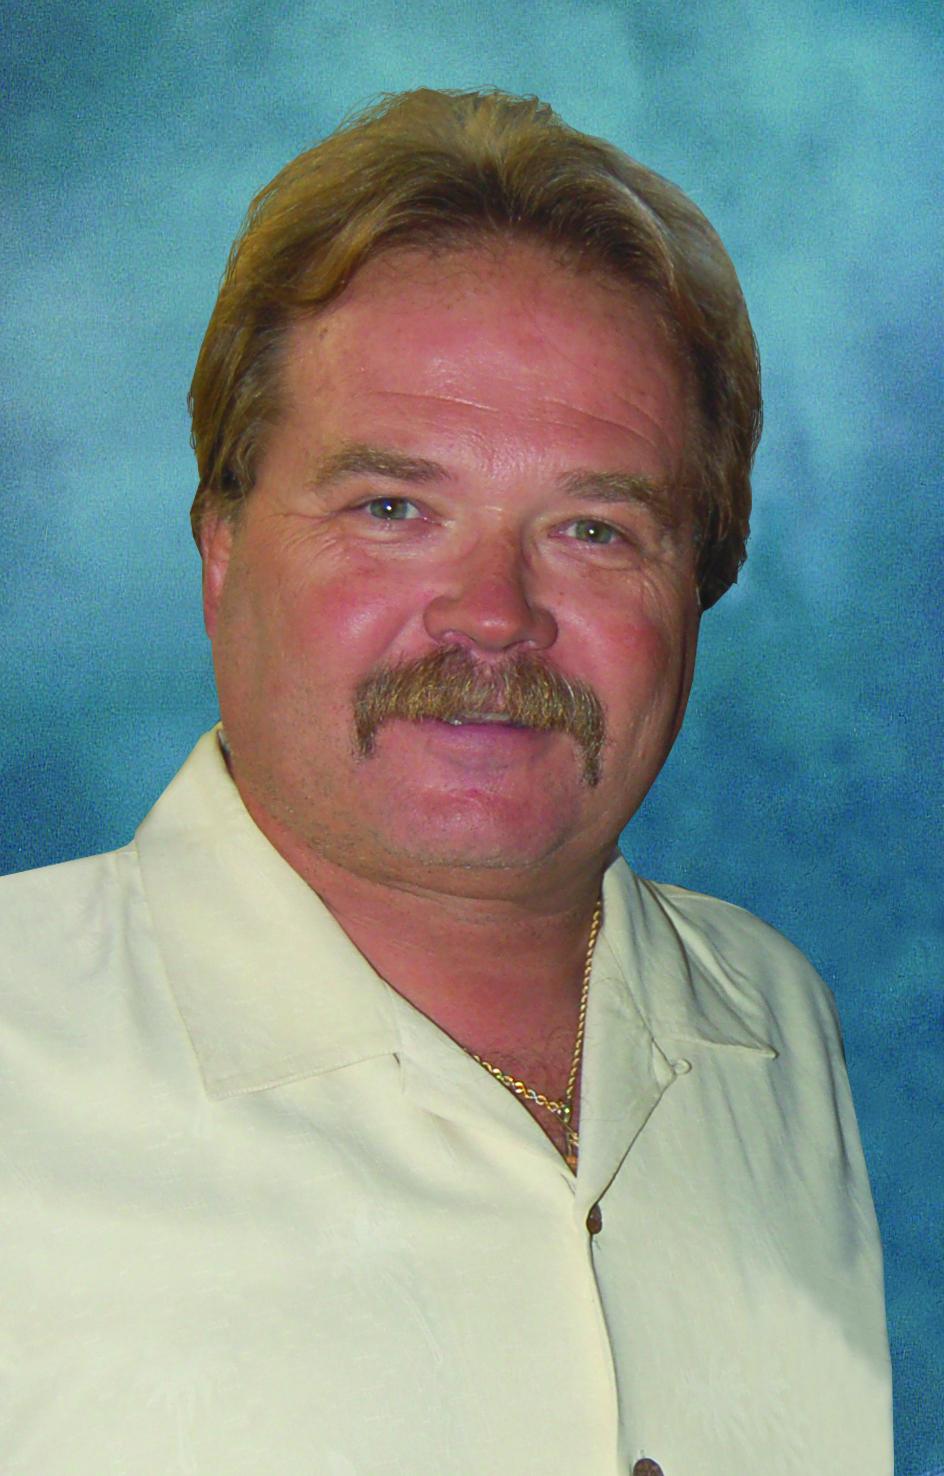 CMA CEO Jeff Barnhart